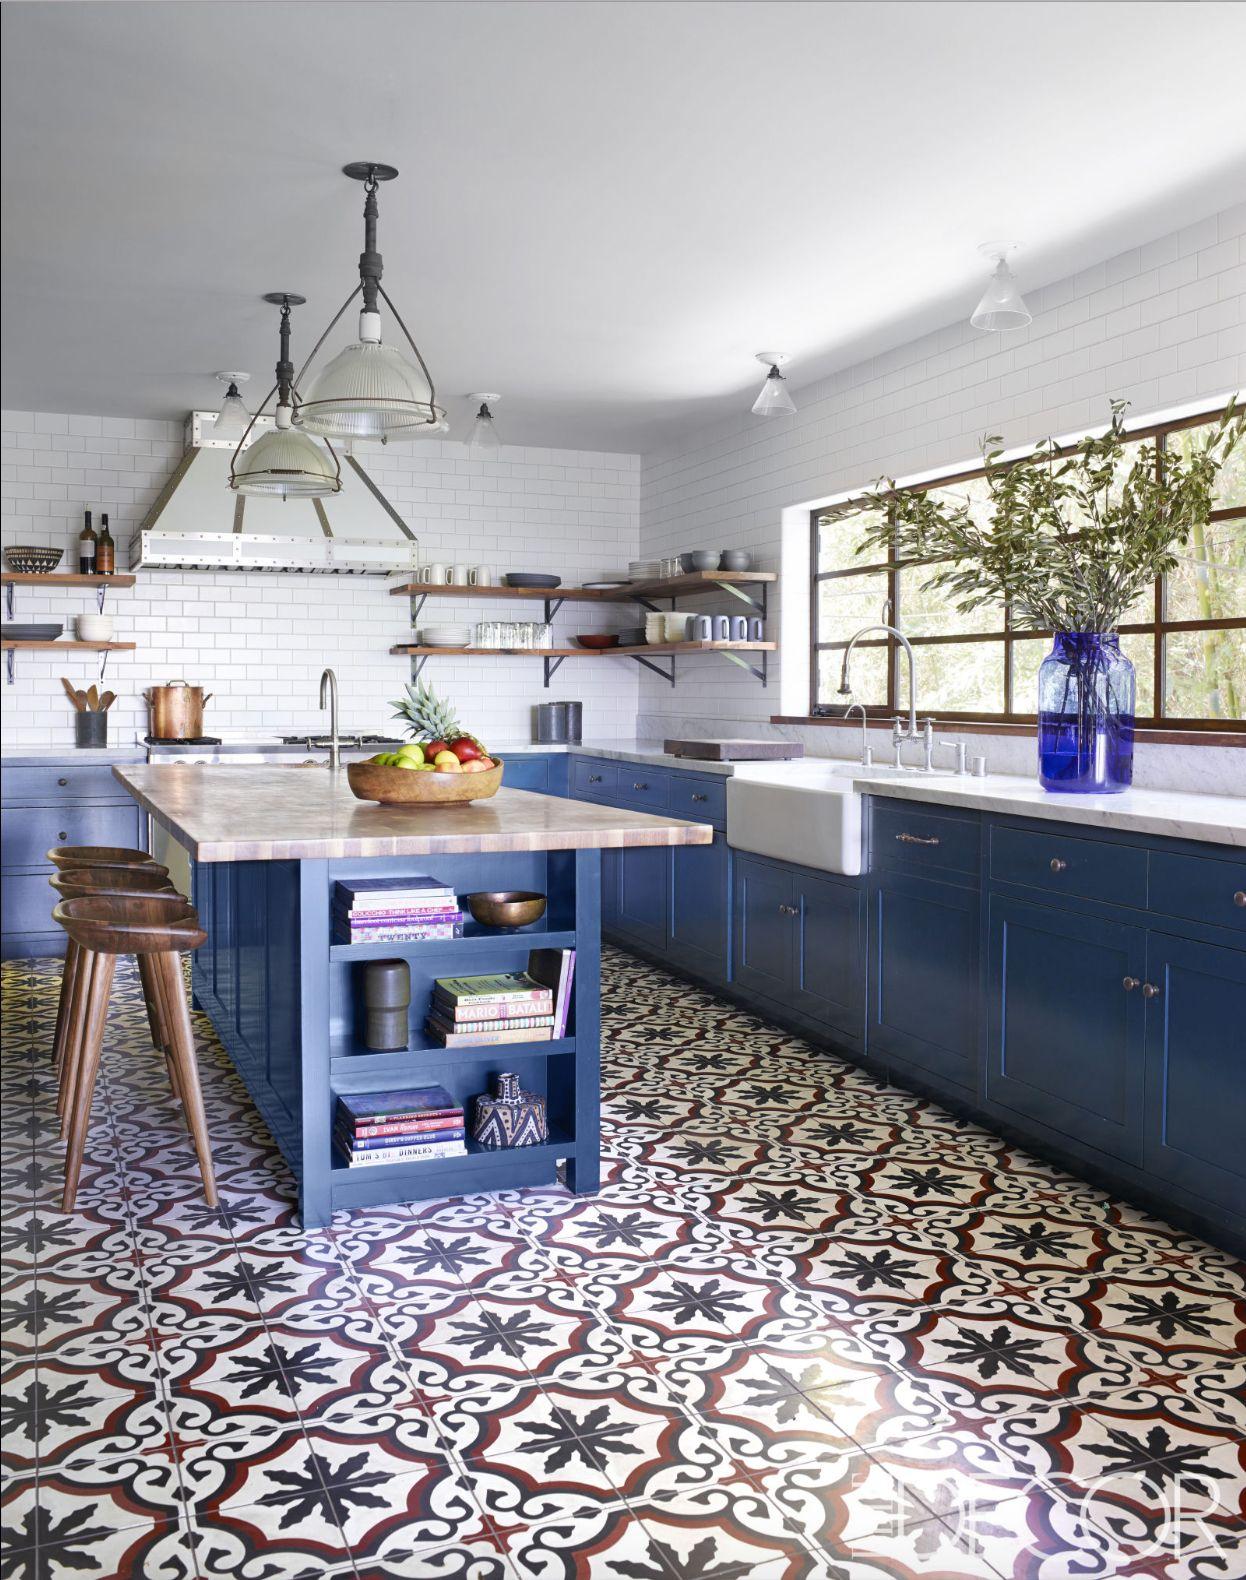 Elle Decor The Cement Tile Blog Kitchen Inspirations Kitchen Flooring Home Kitchens